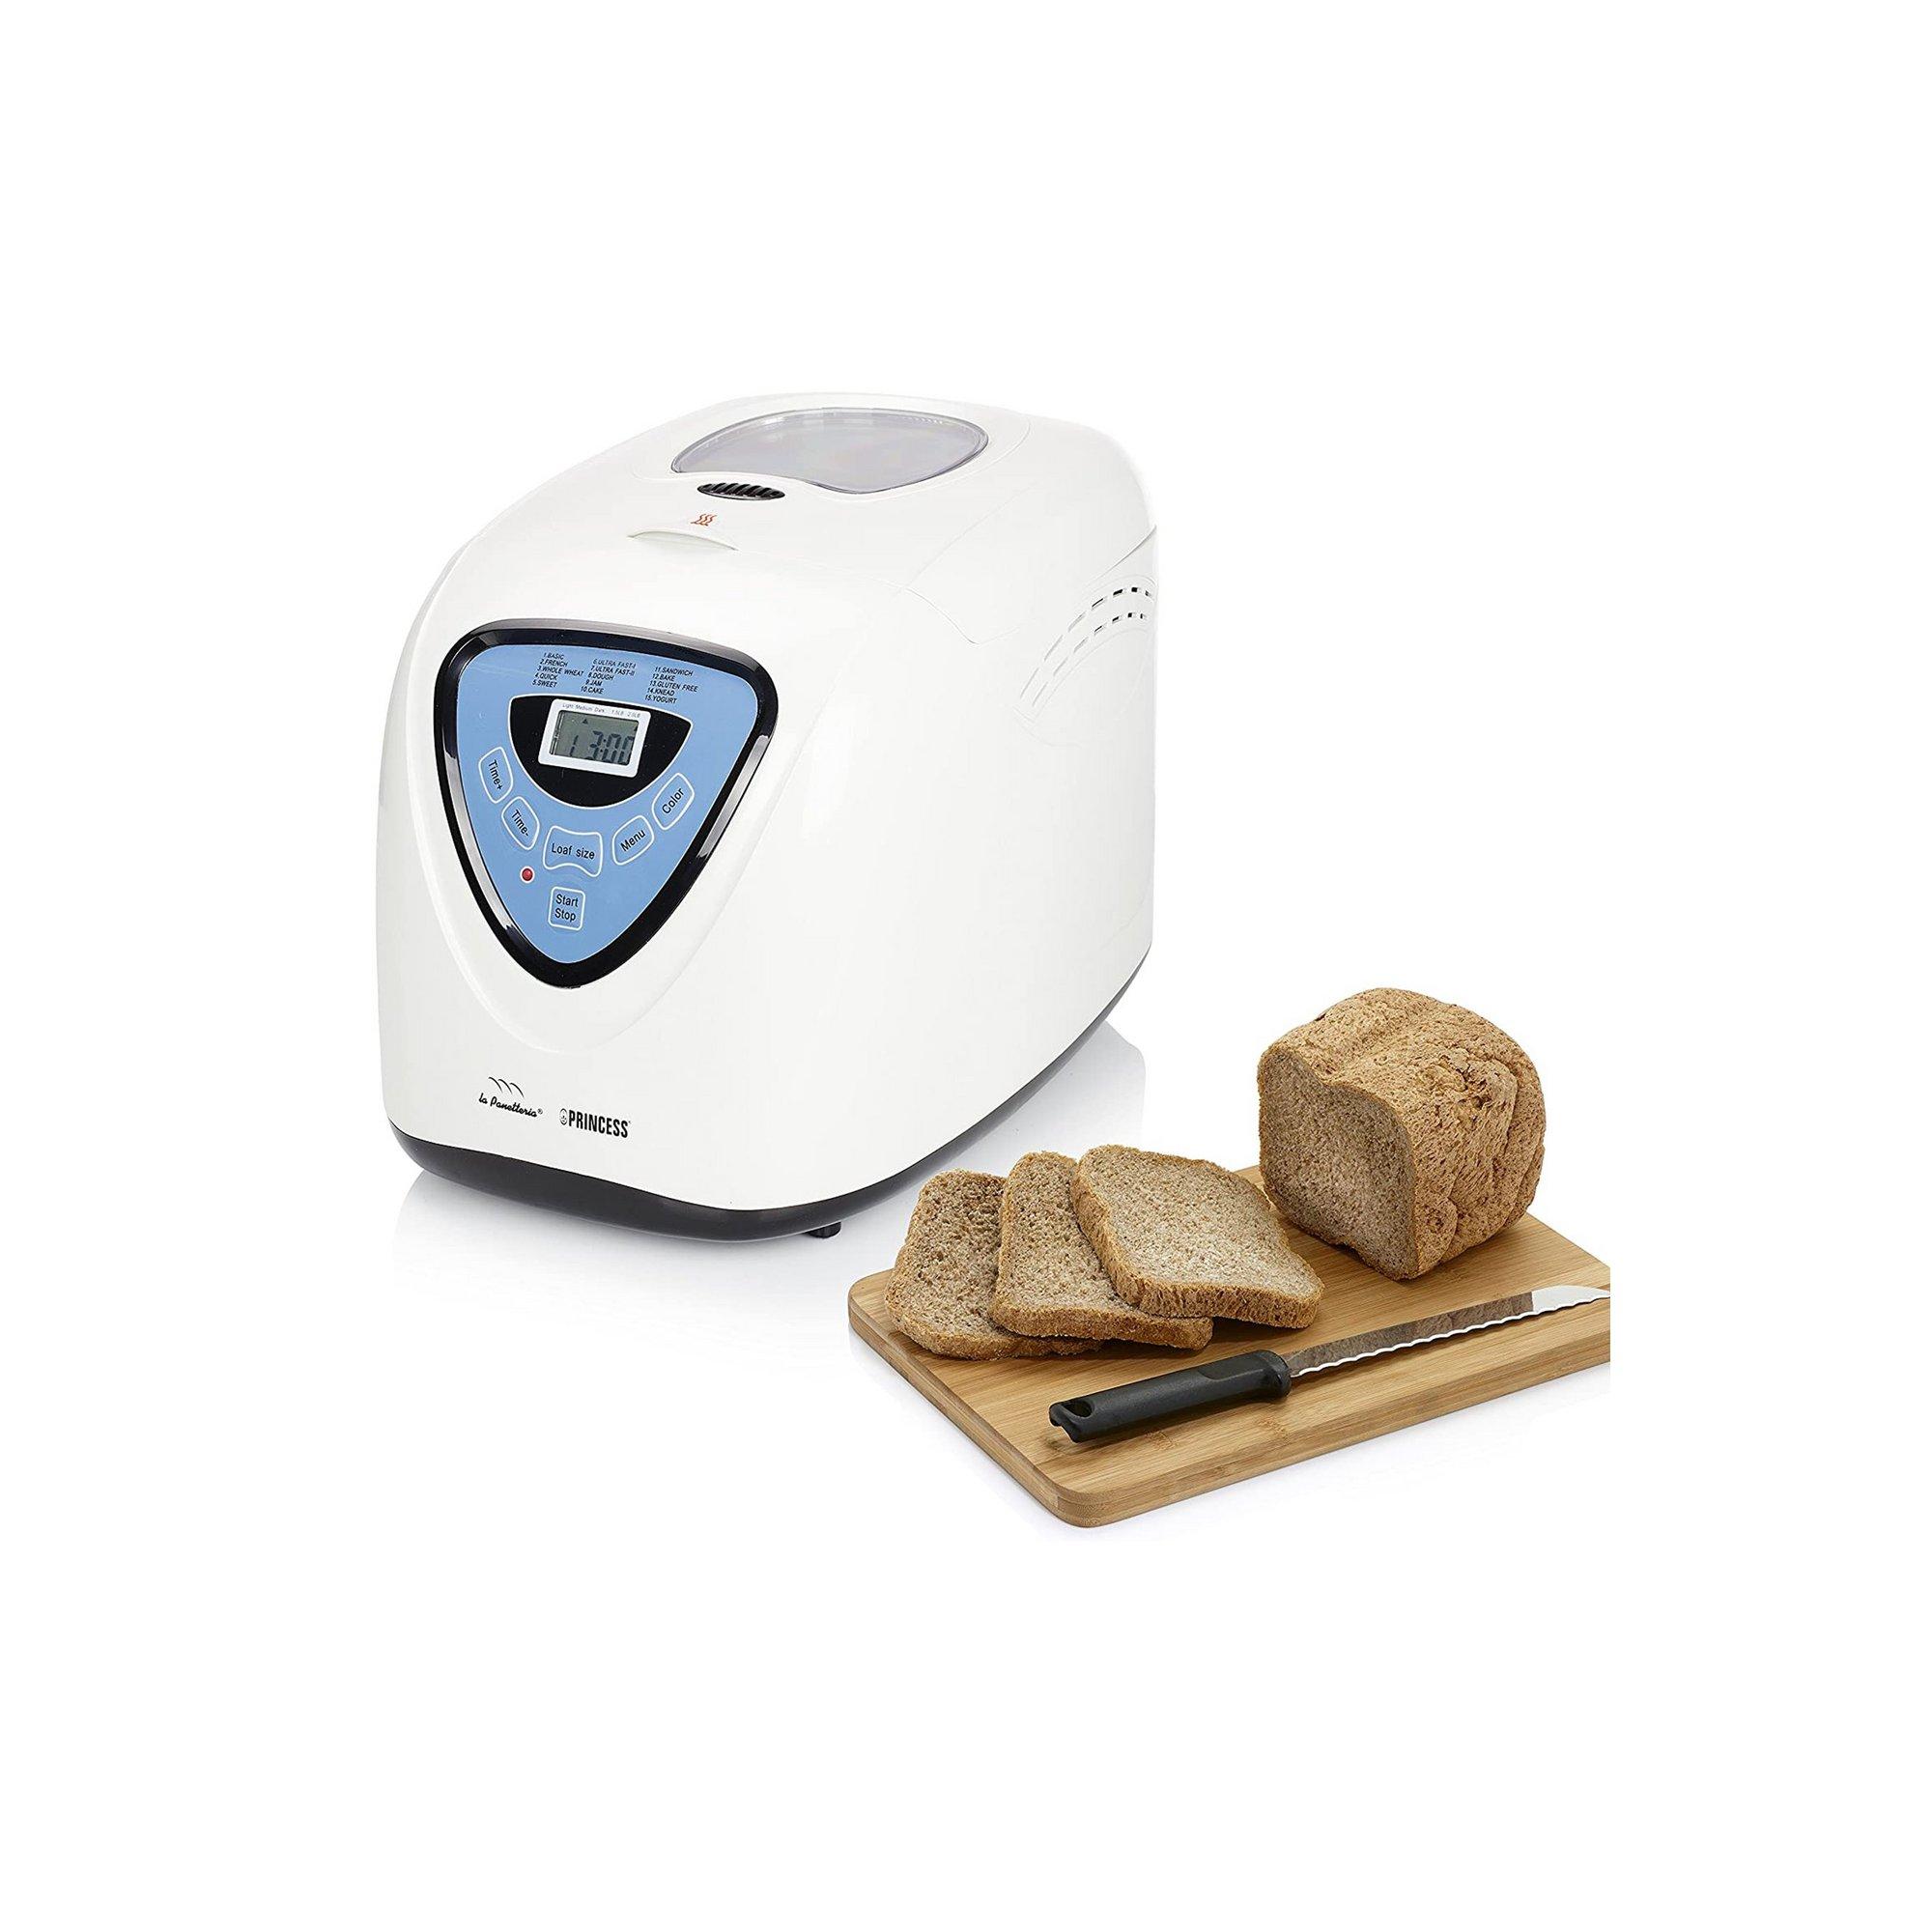 Image of Princess 600W Bread Maker